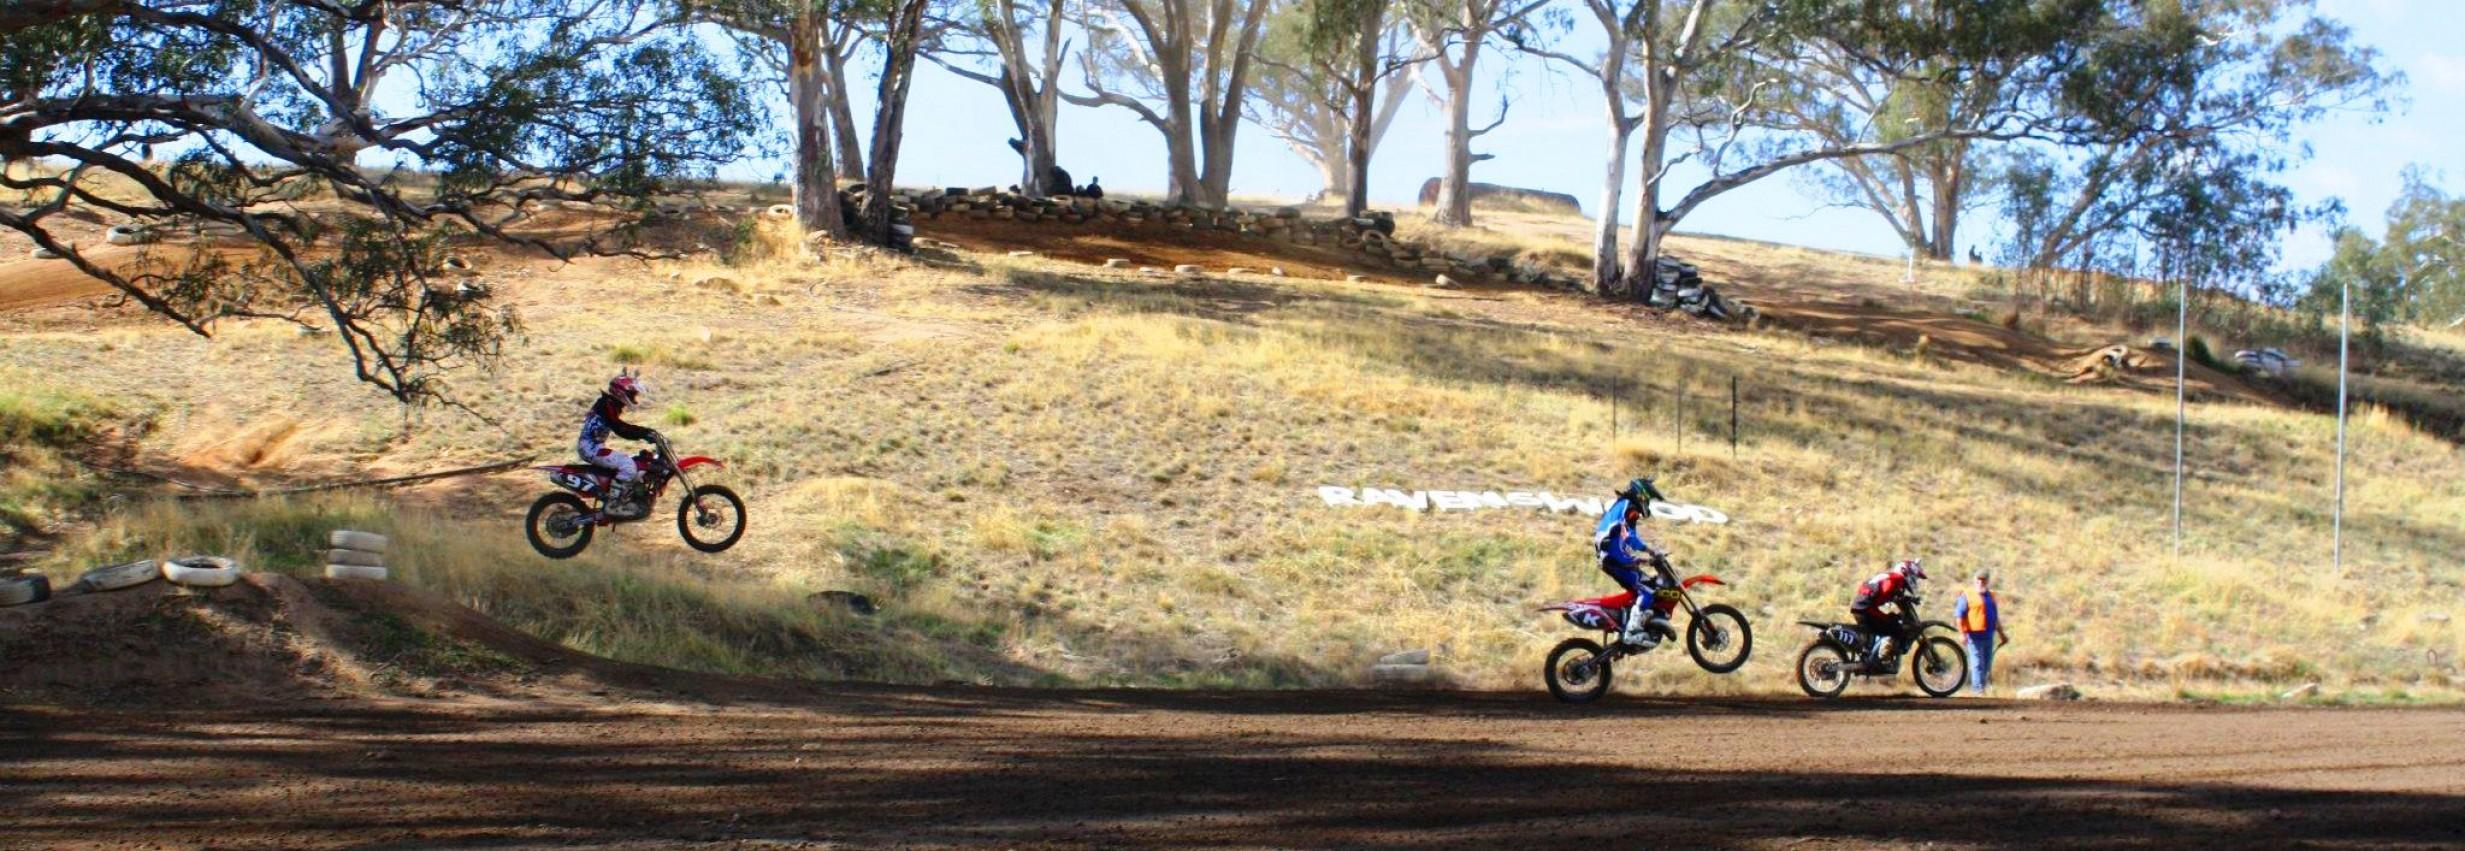 Ravenswood Motocross Track – Bendigo Motorcycle Club